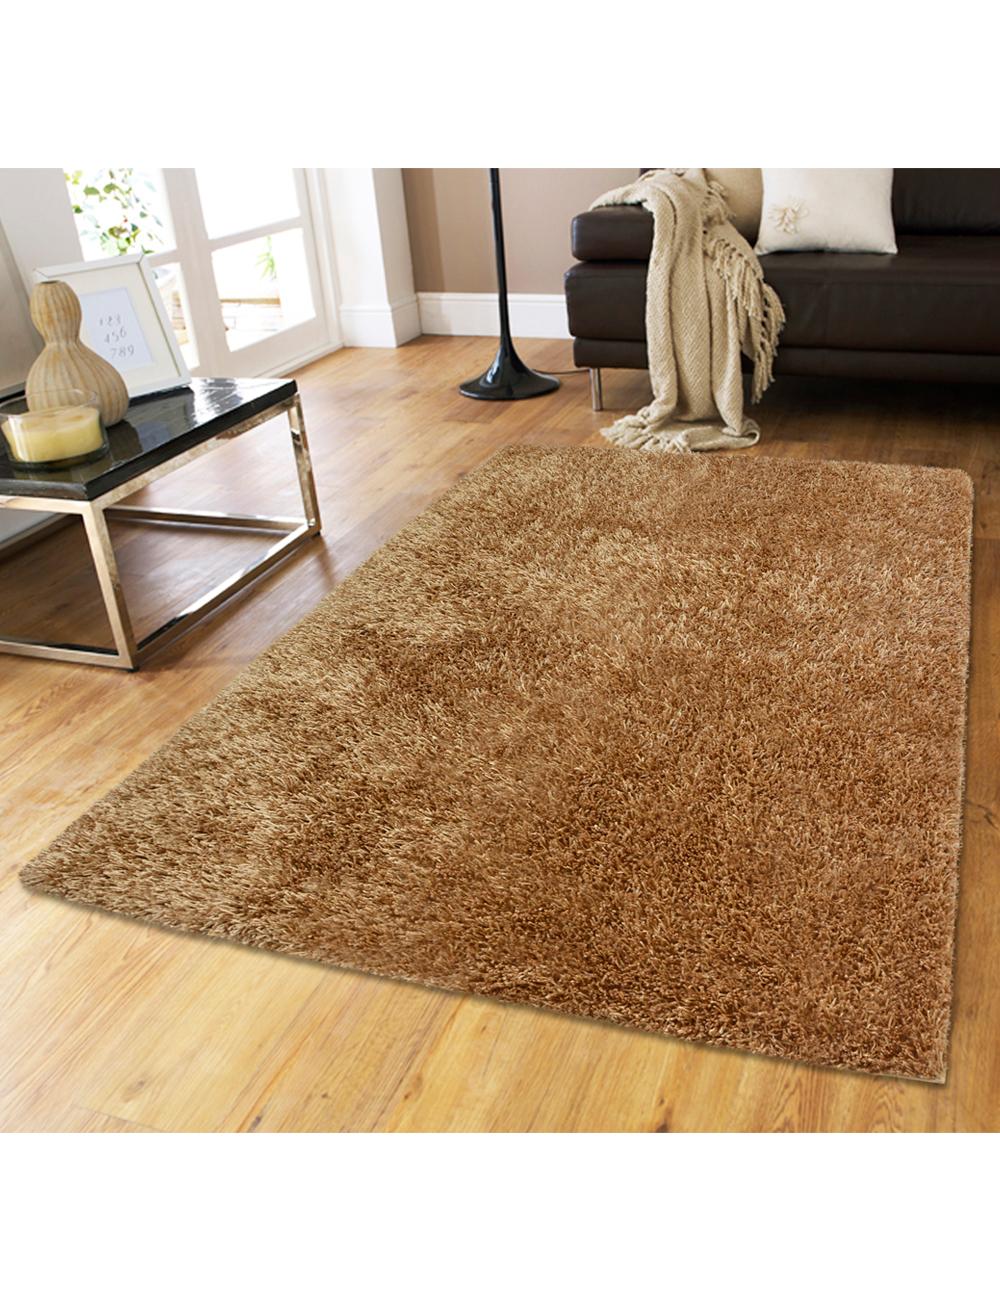 tapis cosy beige 60 x 130 cm. Black Bedroom Furniture Sets. Home Design Ideas